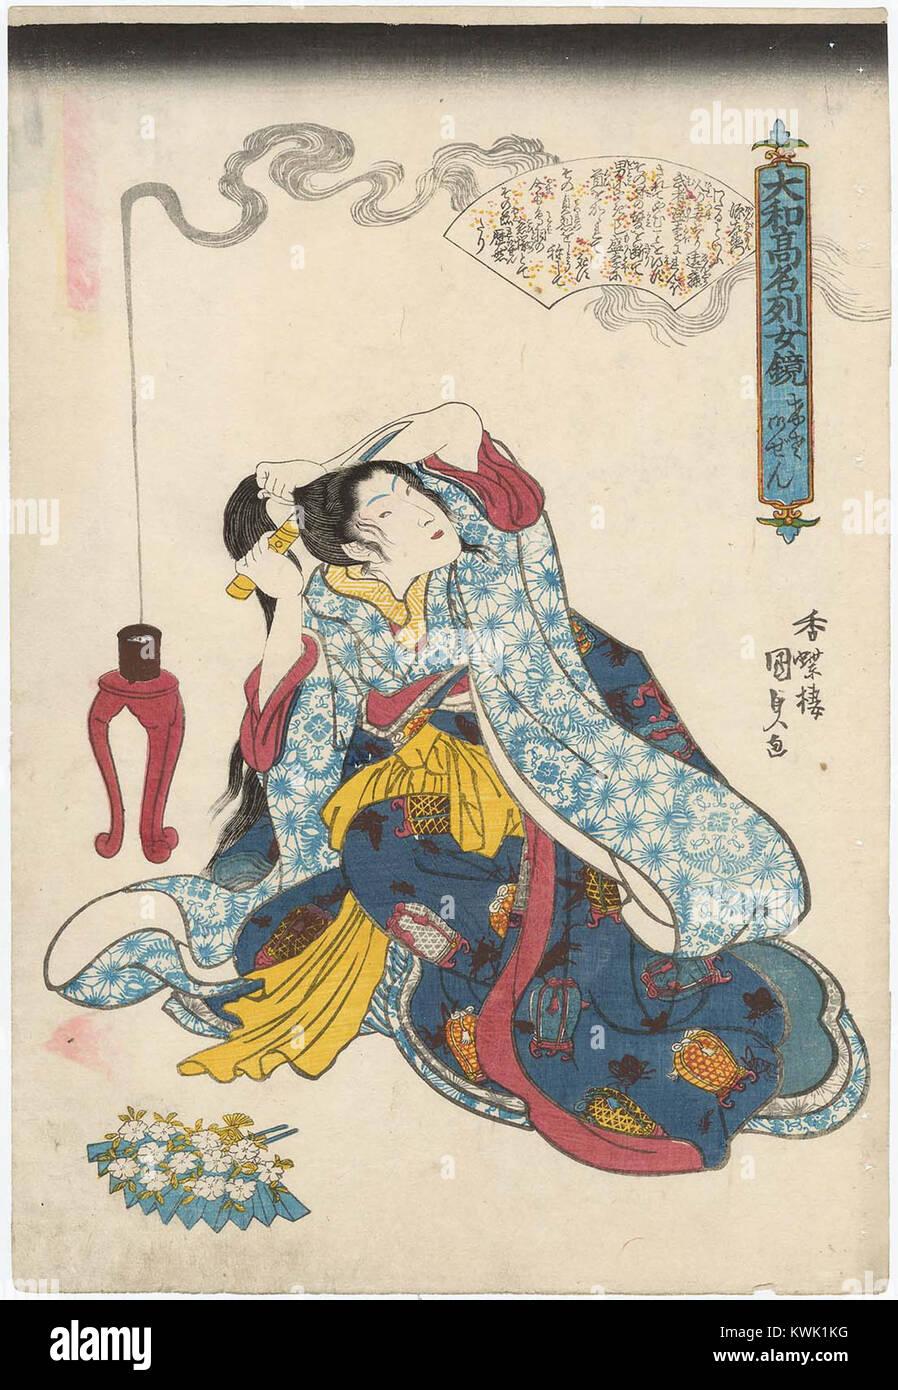 Yamato kōmei retsujo kagami, Kesa Gozen by Kunisada - Stock Image